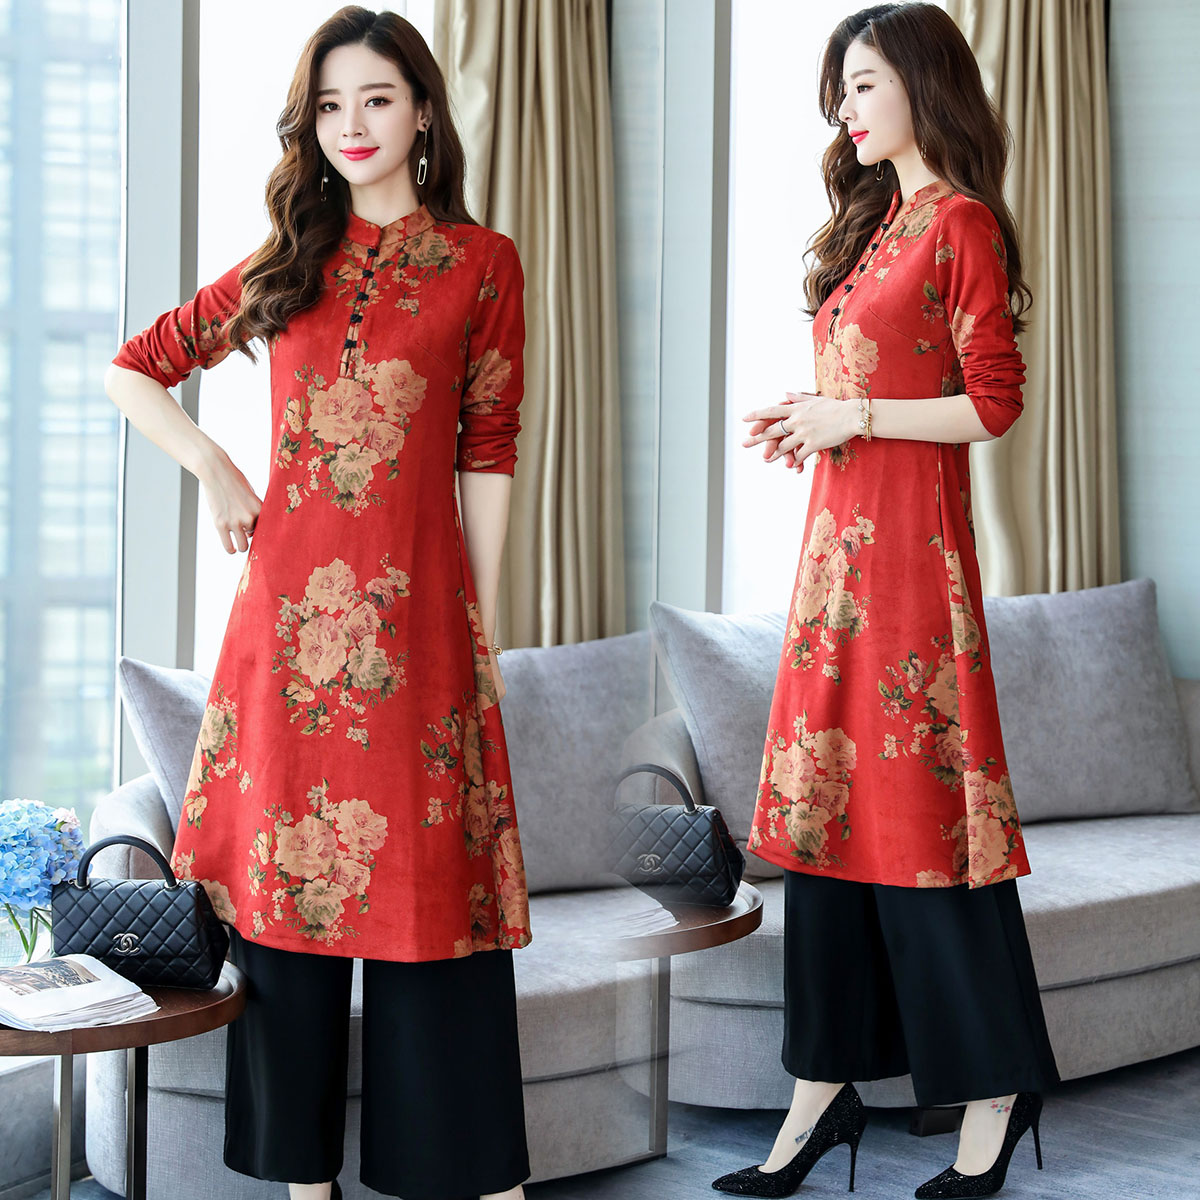 Ethnic Women's Clothing 2018 Autumn New Slimming Retro Improved Cheongsam Dress Pants Set Two-piece Suit